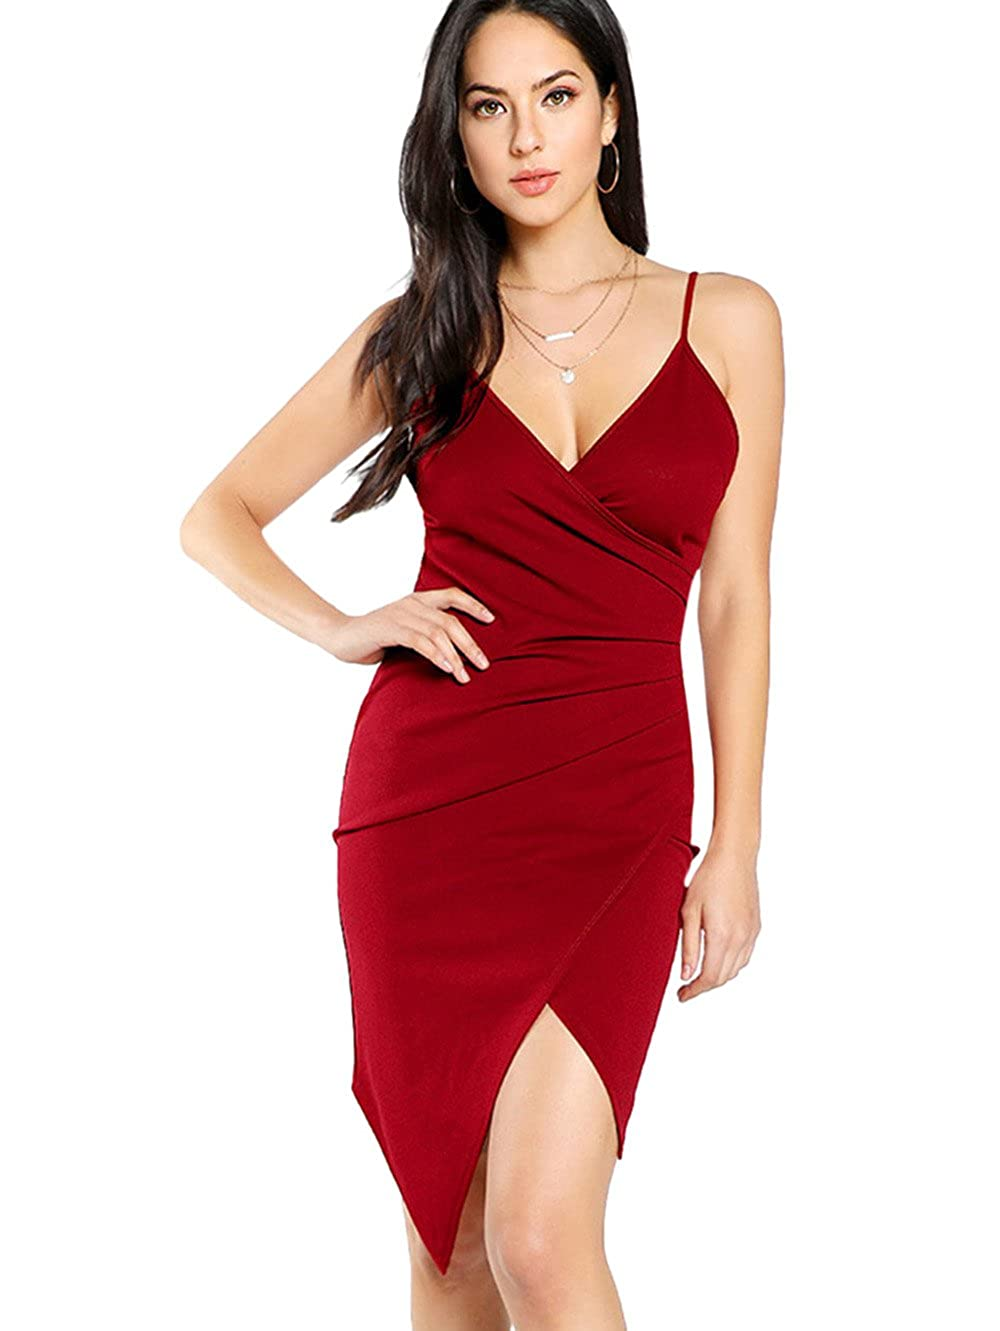 Red SheIn Women's Sexy V Neck Spaghetti Strap Ruched Overlap Bodycon Dress